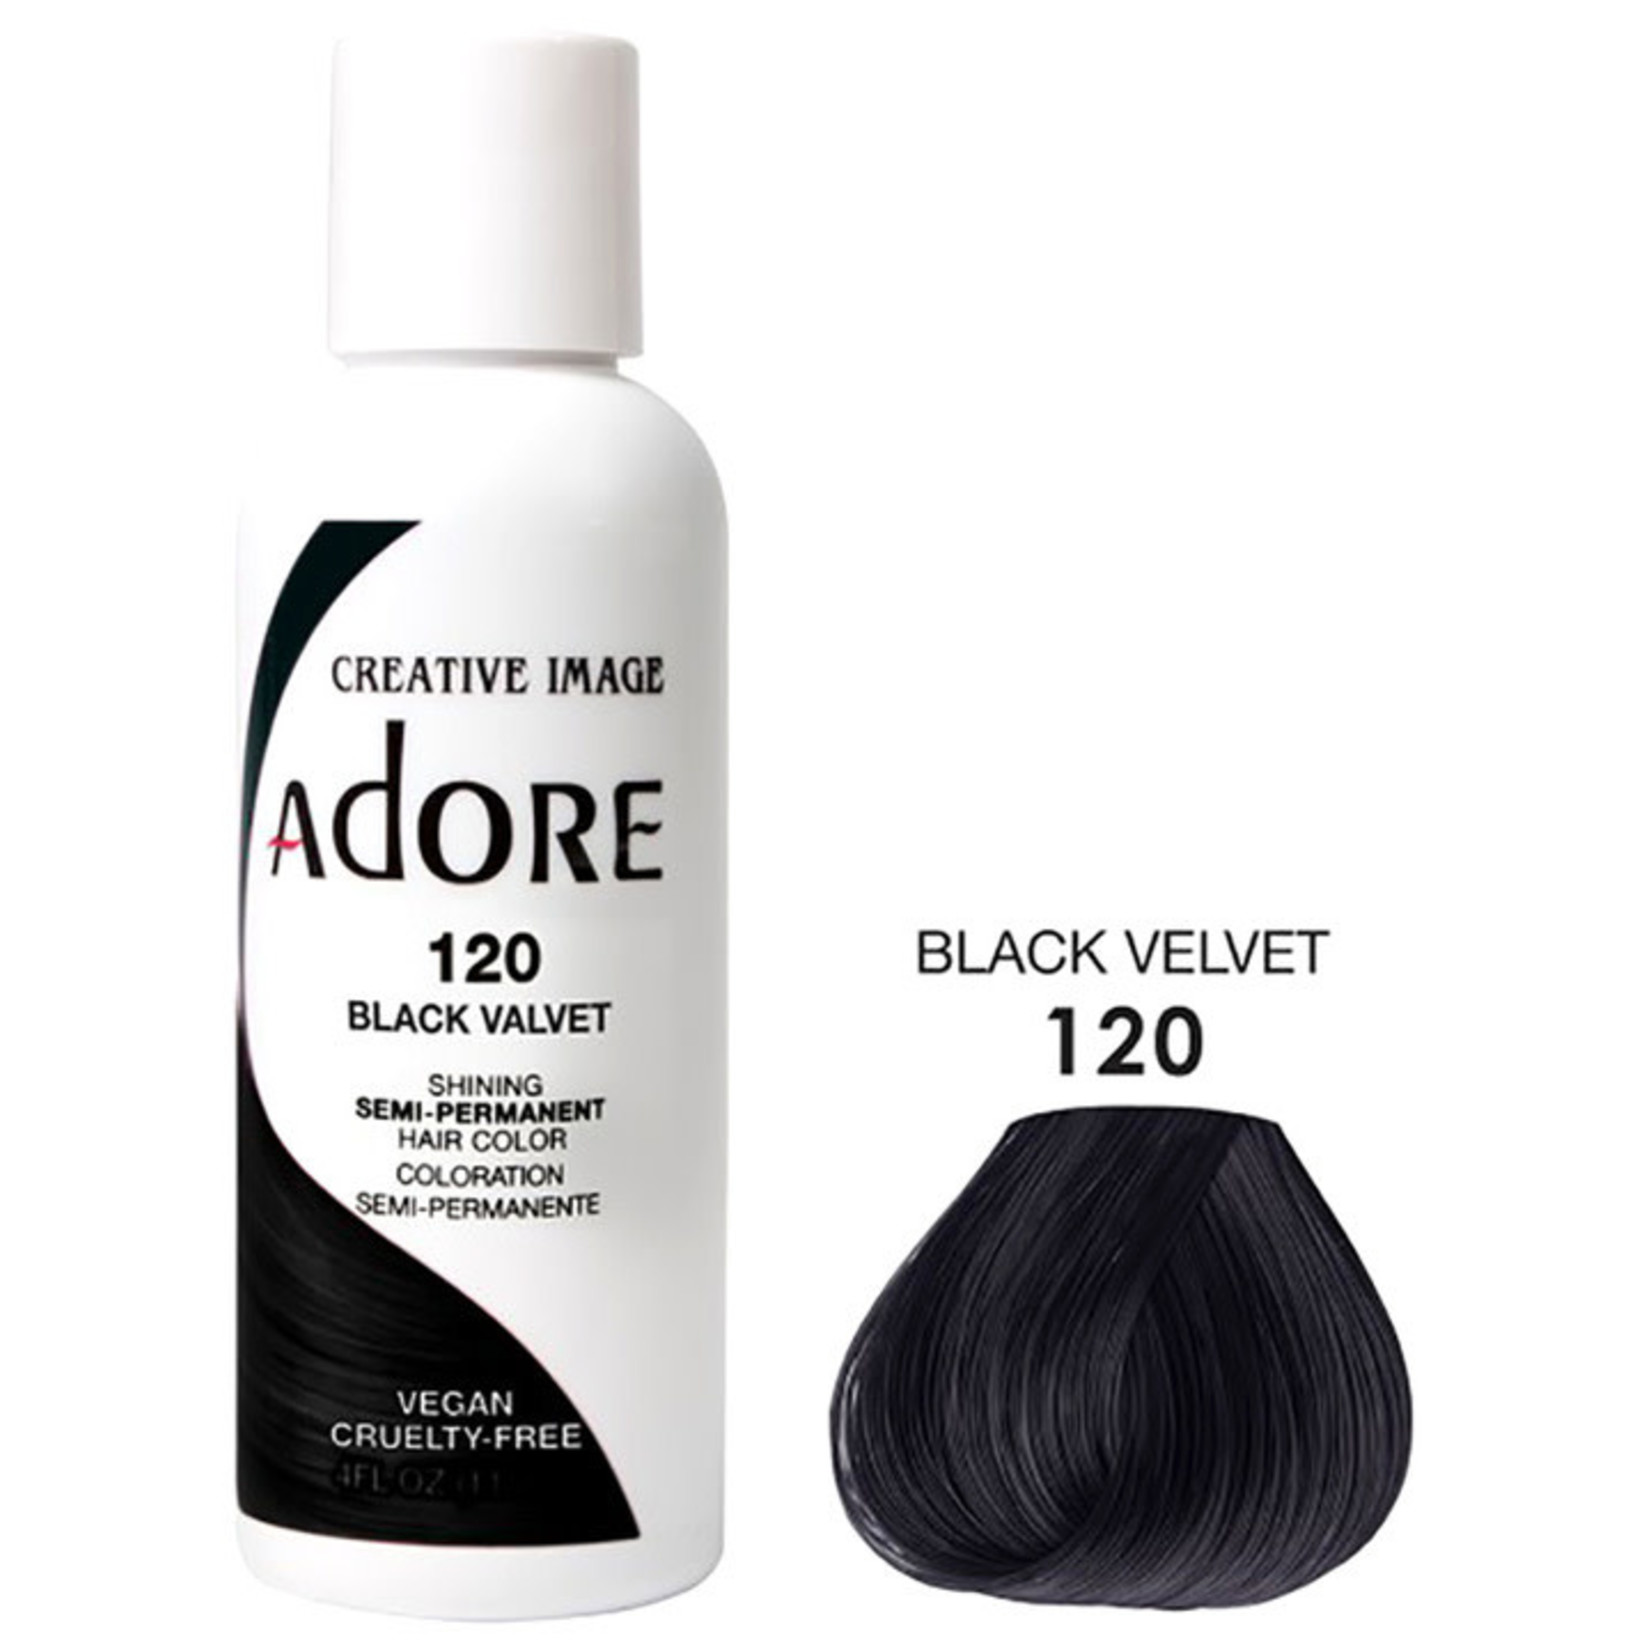 ADORE ADORE SEMI PERMANENT HAIR COLOR